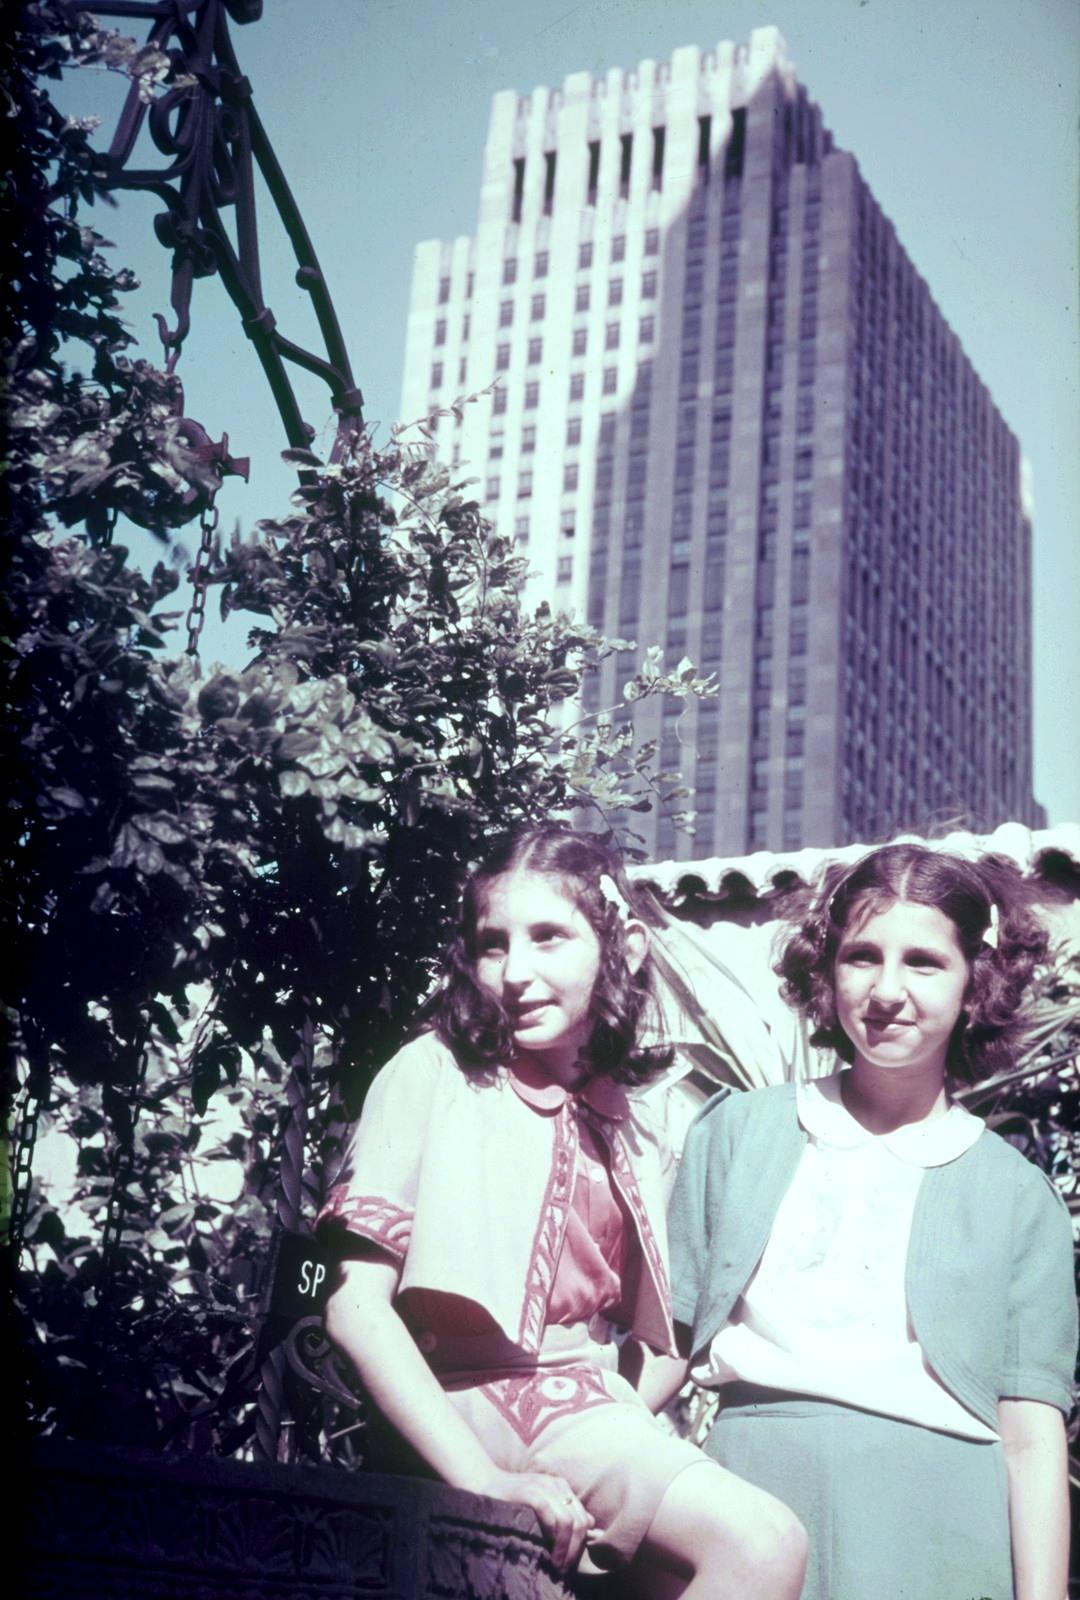 Нью-Йорк. Две девушки на Манхэттене